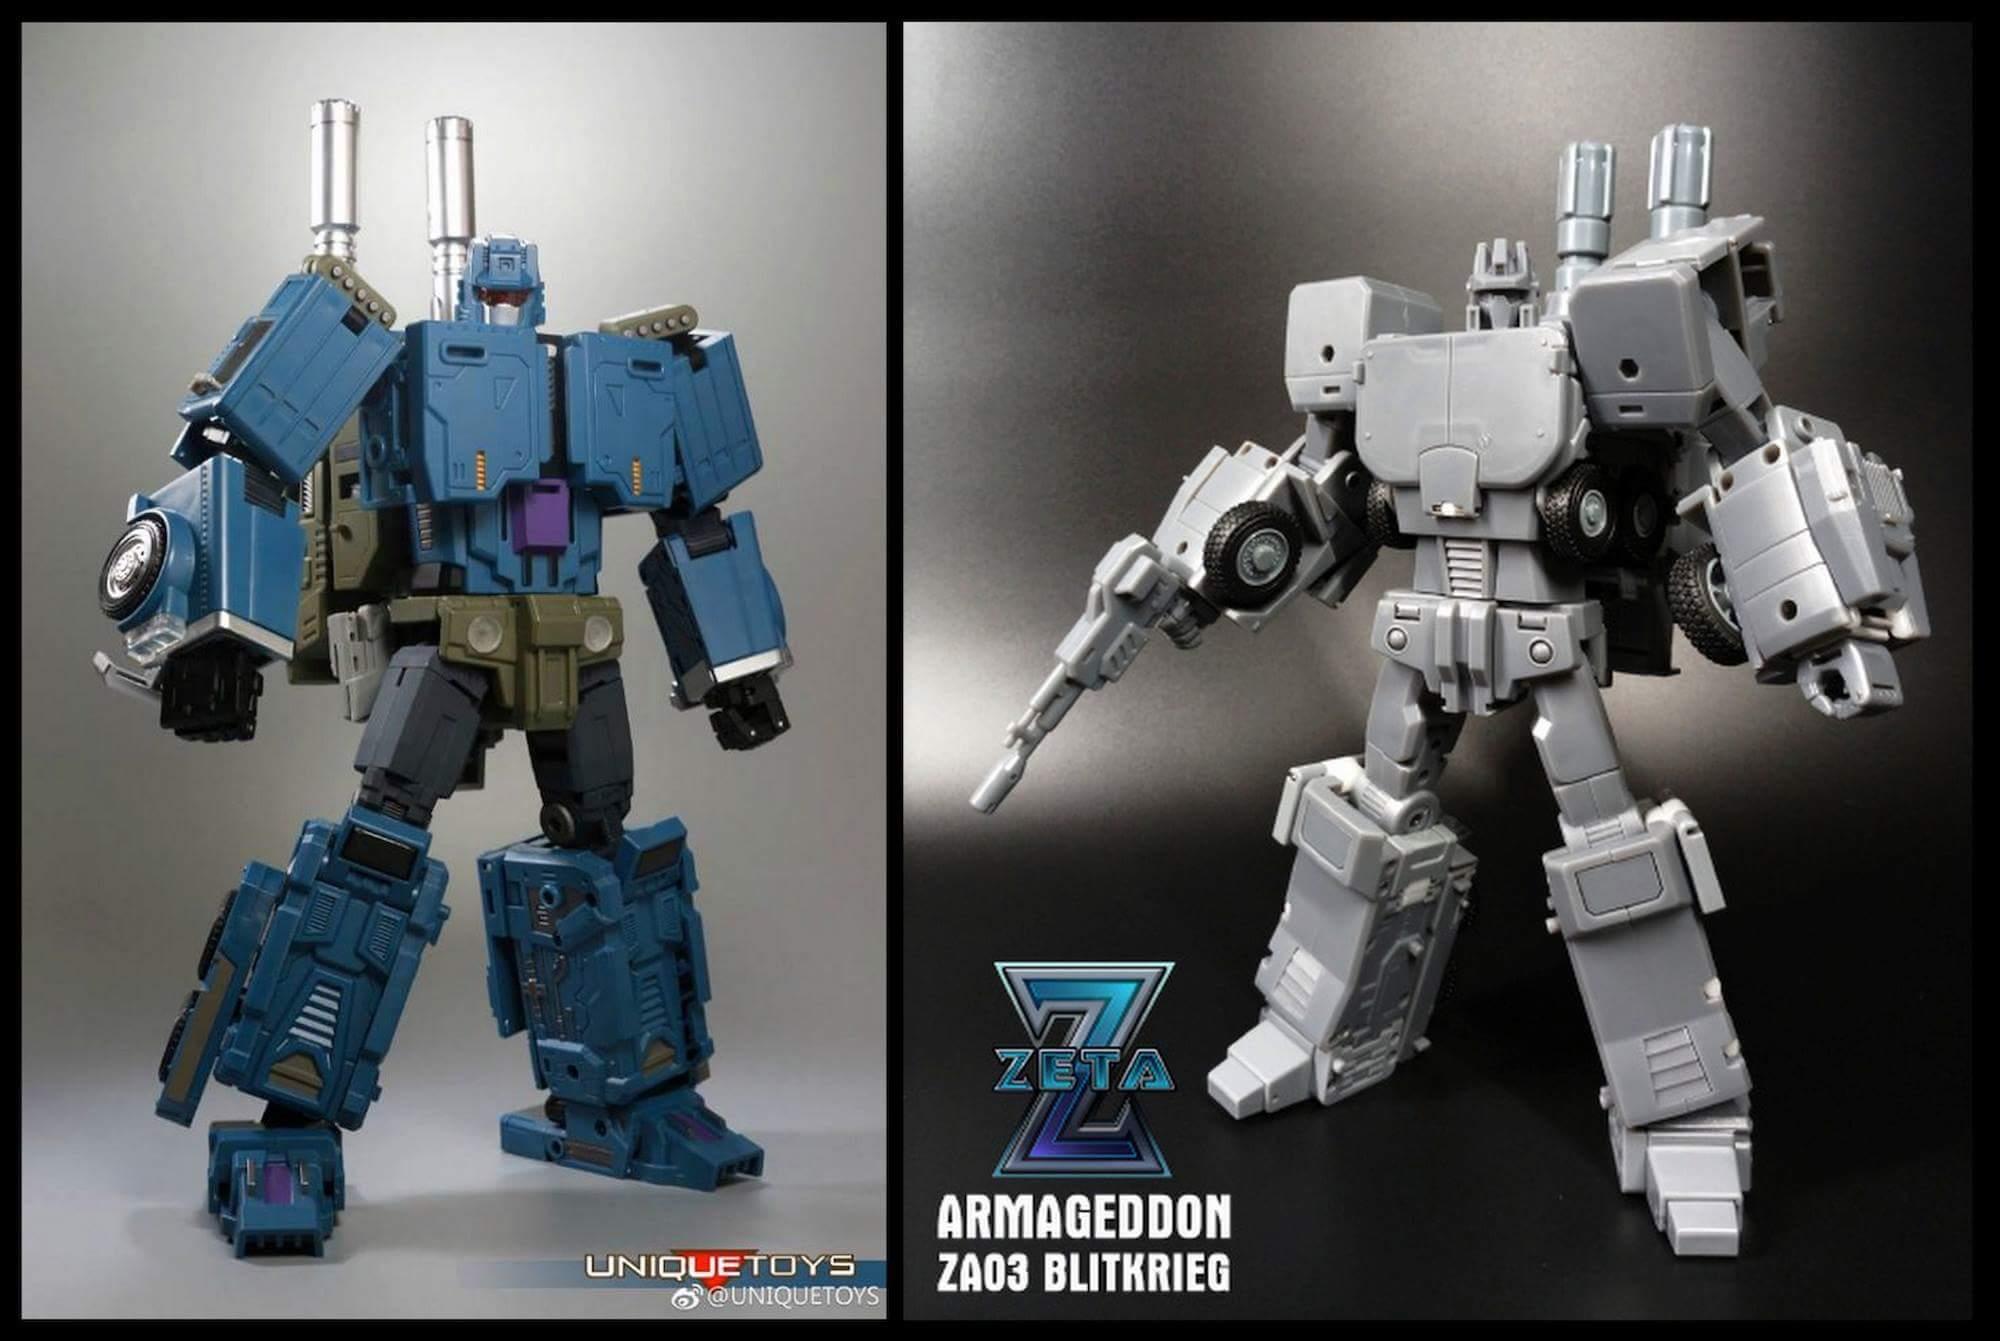 [Zeta Toys] Produit Tiers - Armageddon (ZA-01 à ZA-05) - ZA-06 Bruticon - ZA-07 Bruticon ― aka Bruticus (Studio OX, couleurs G1, métallique) - Page 4 YAHJ43u3_o